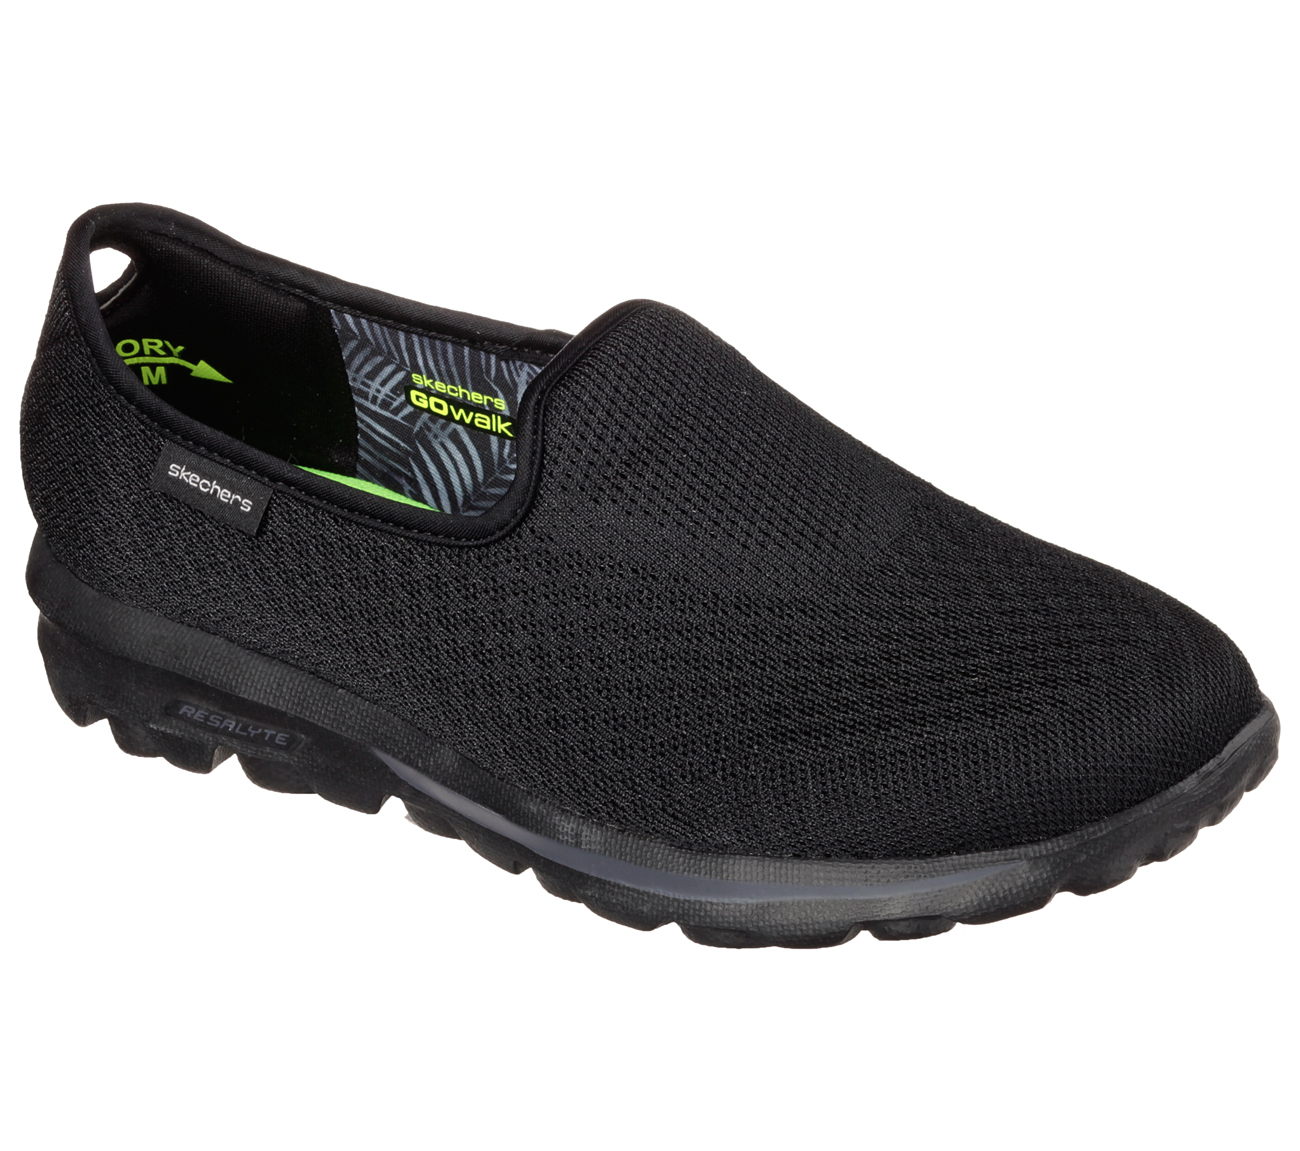 Skechers Stride White Women Athletic Shoes -11635 WSL_View_1/fashion/sports/skechers